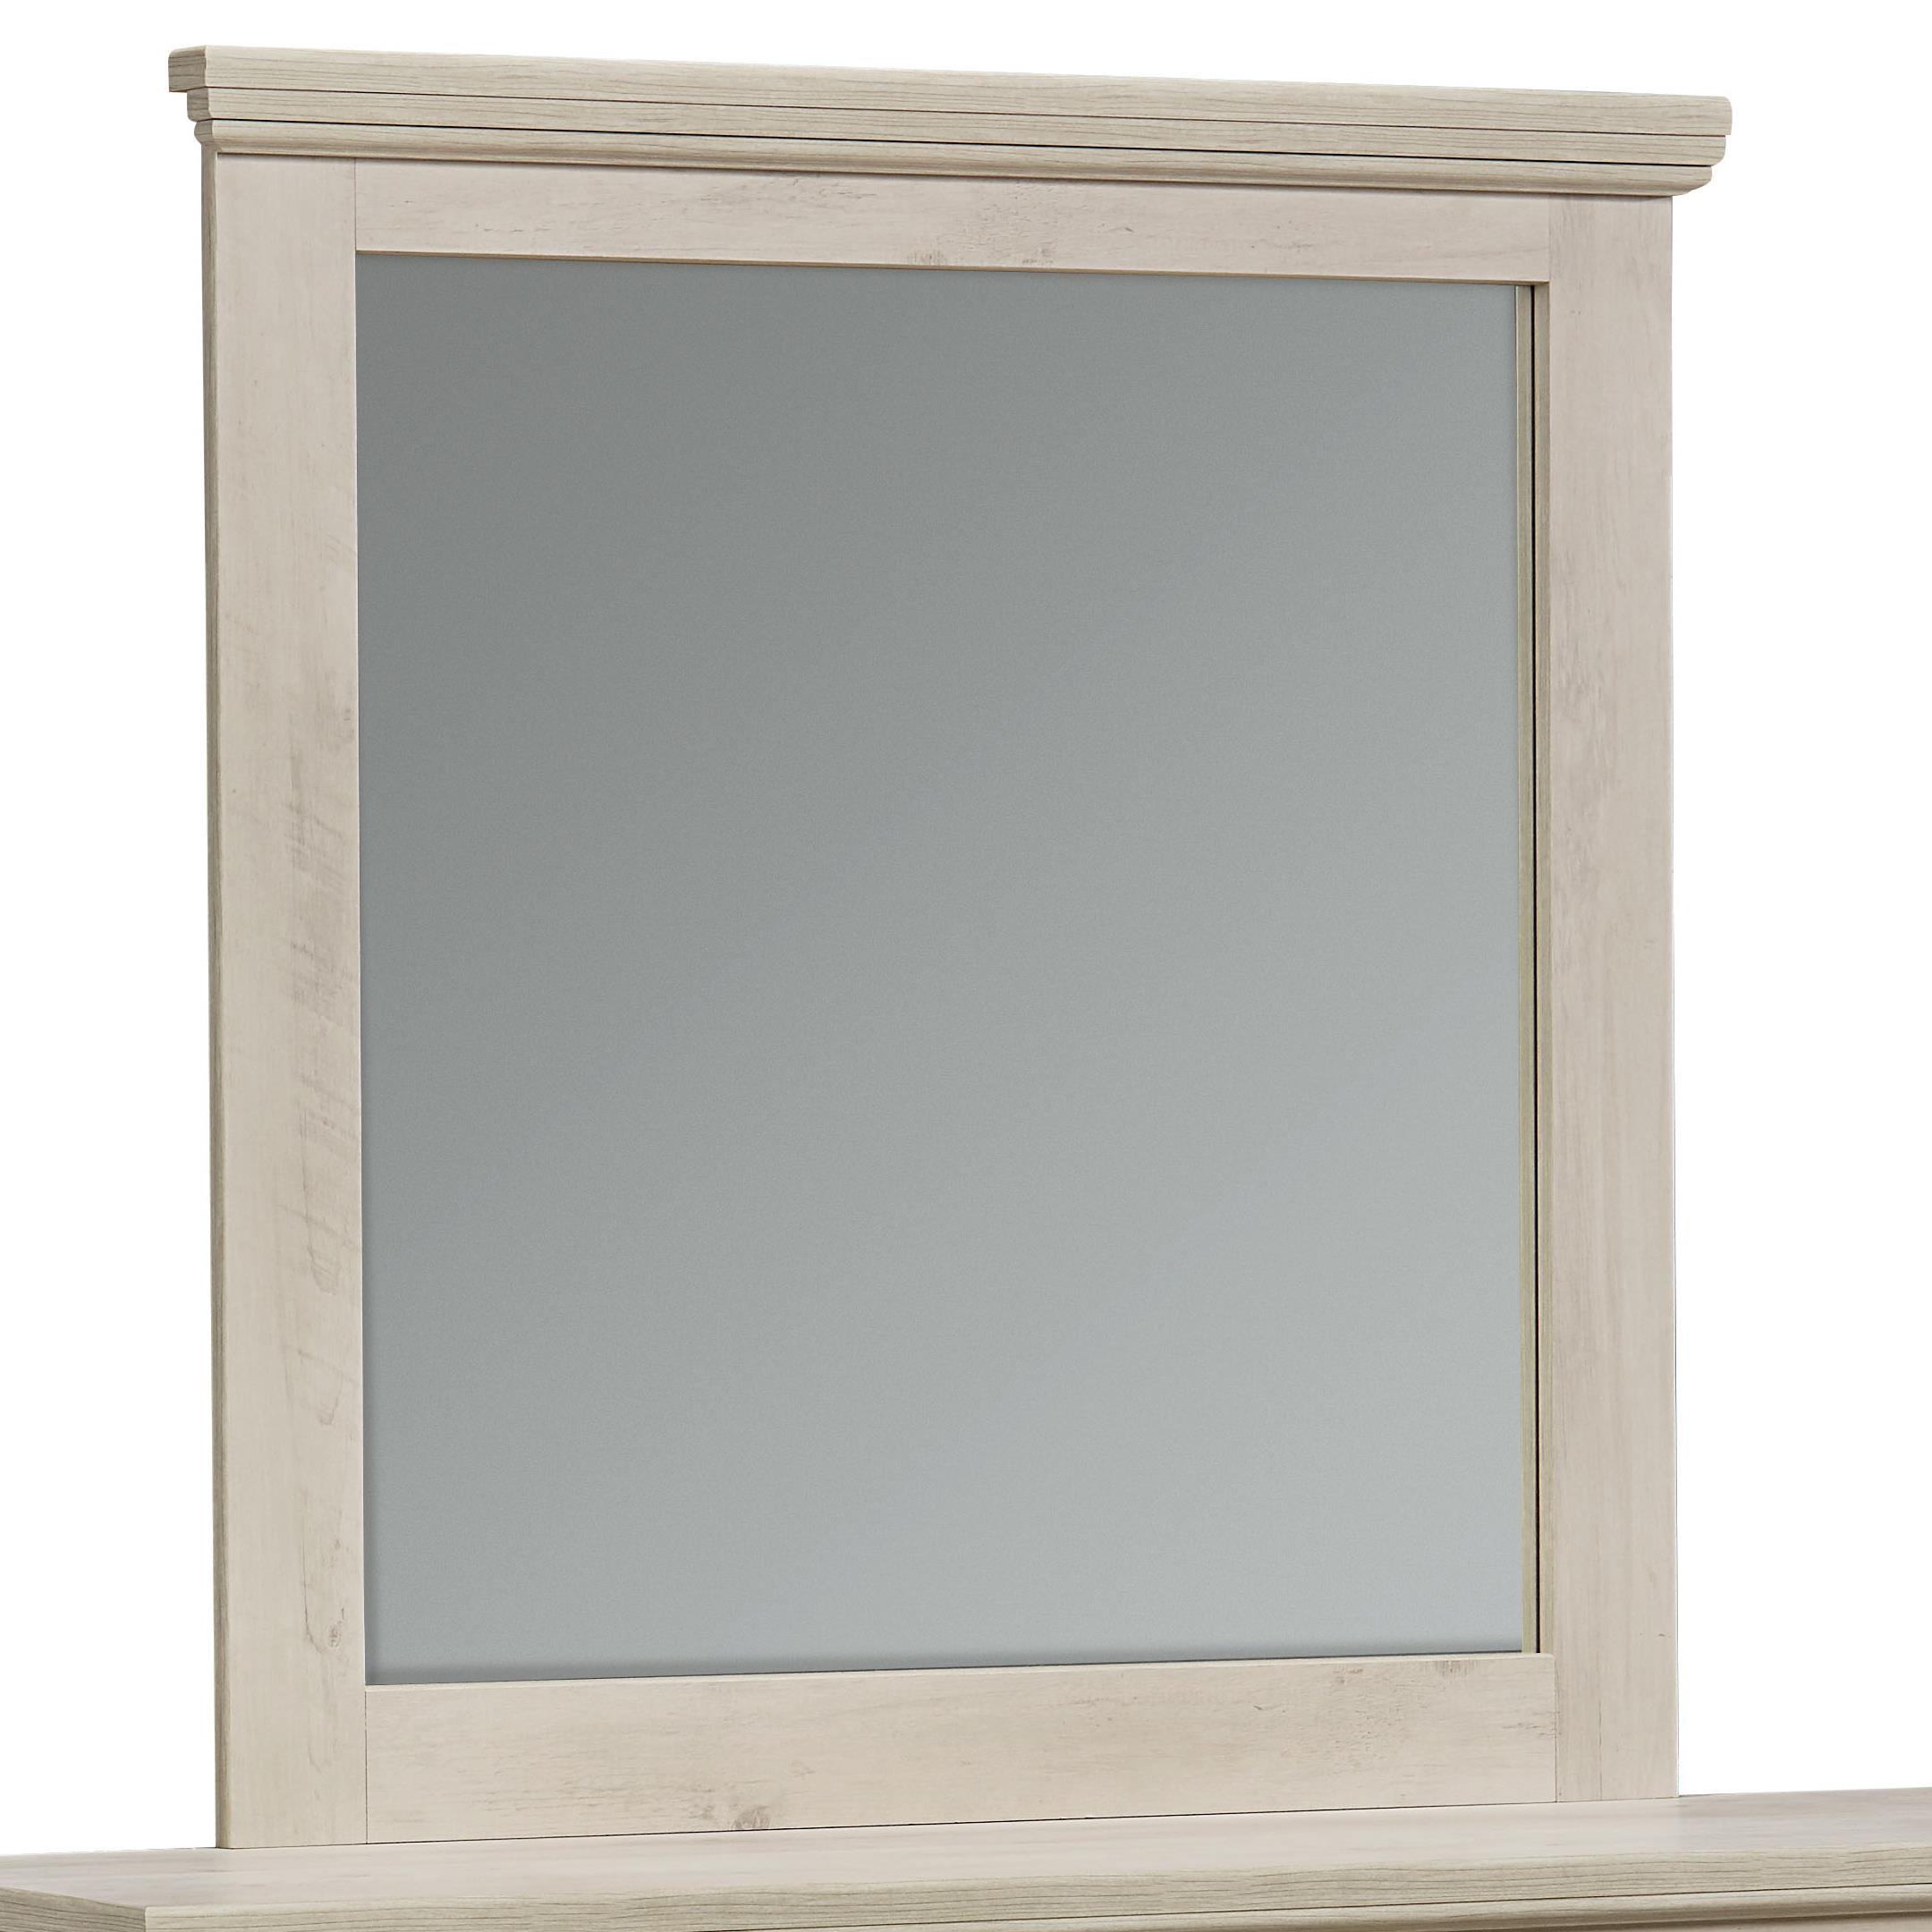 Standard Furniture Outland Lite Mirror - Item Number: 62958